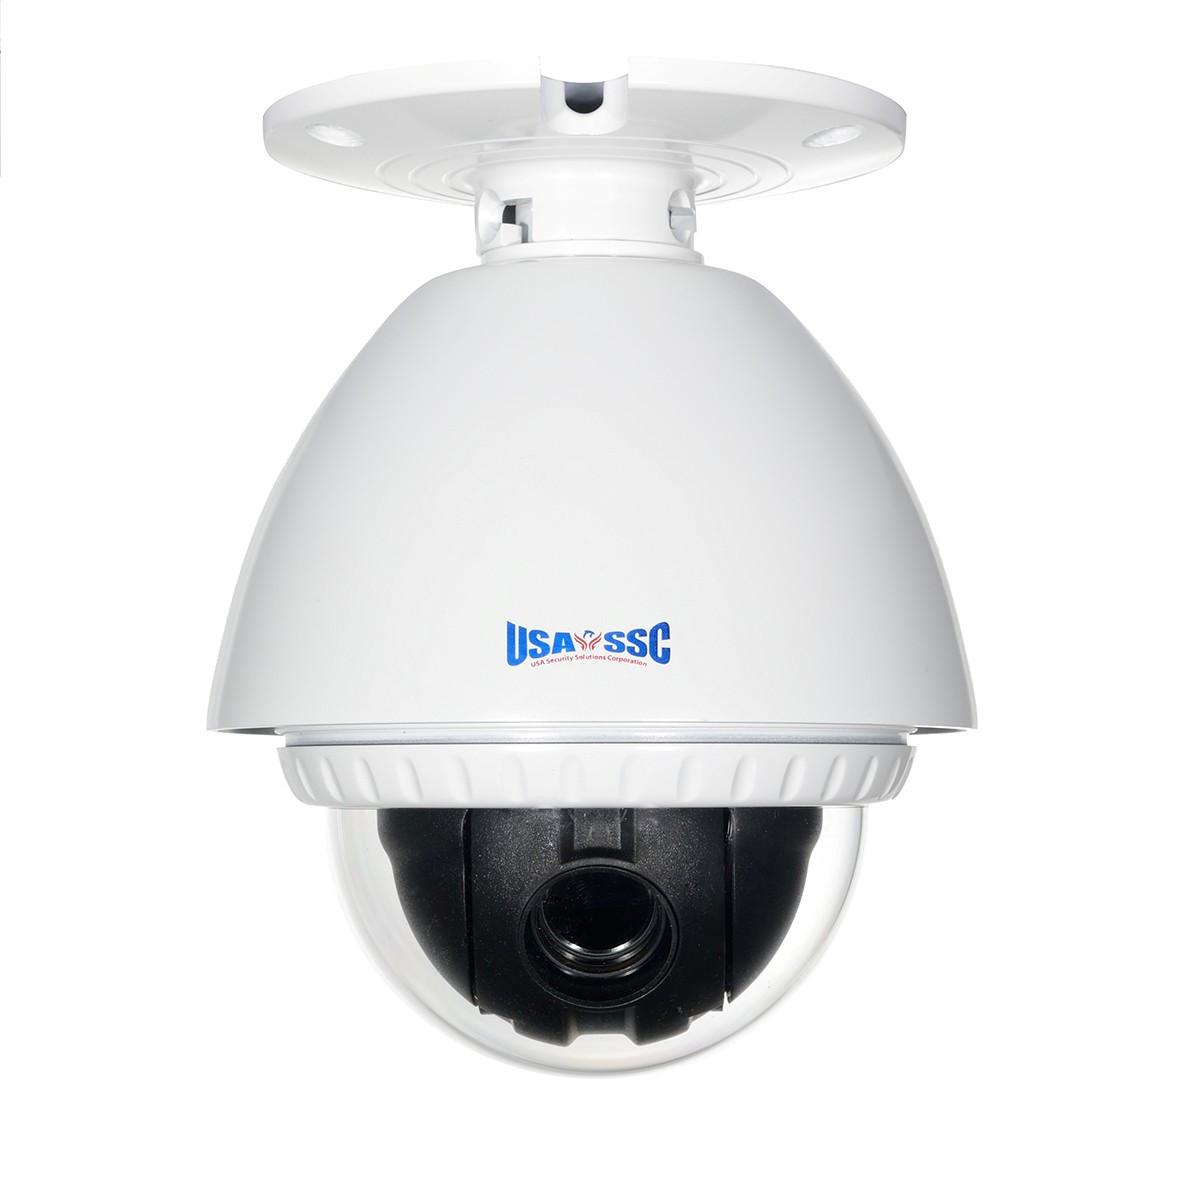 Outdoor  Mini PTZ Speed Dome Camera Color, 500TVL, 18x Zoom, 12VDC. NTSC, White Housing